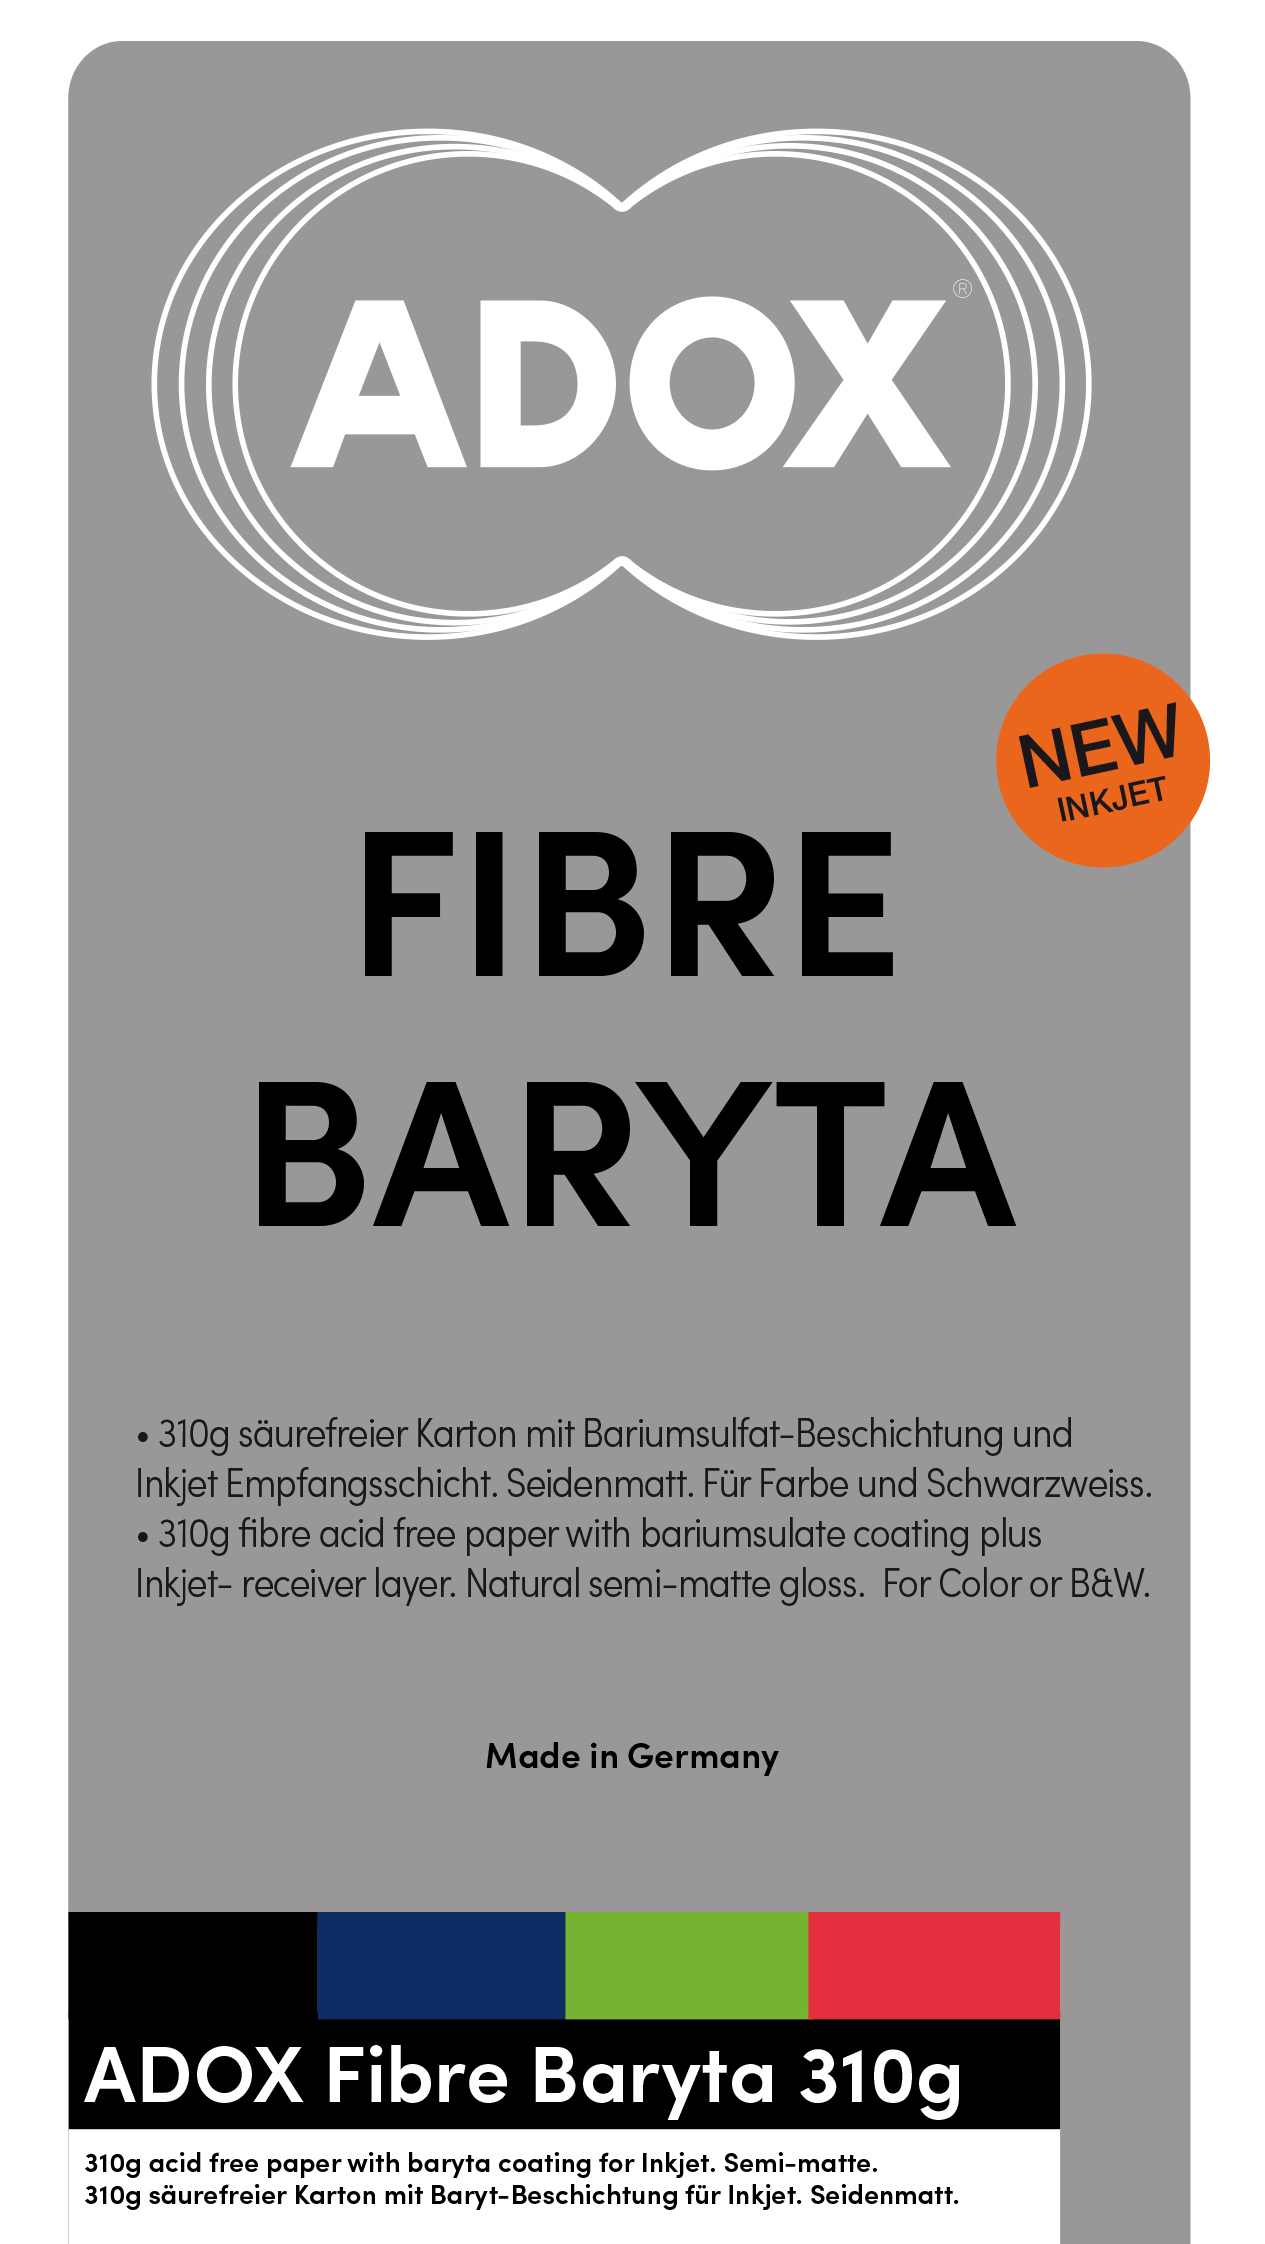 Fibre-Baryta